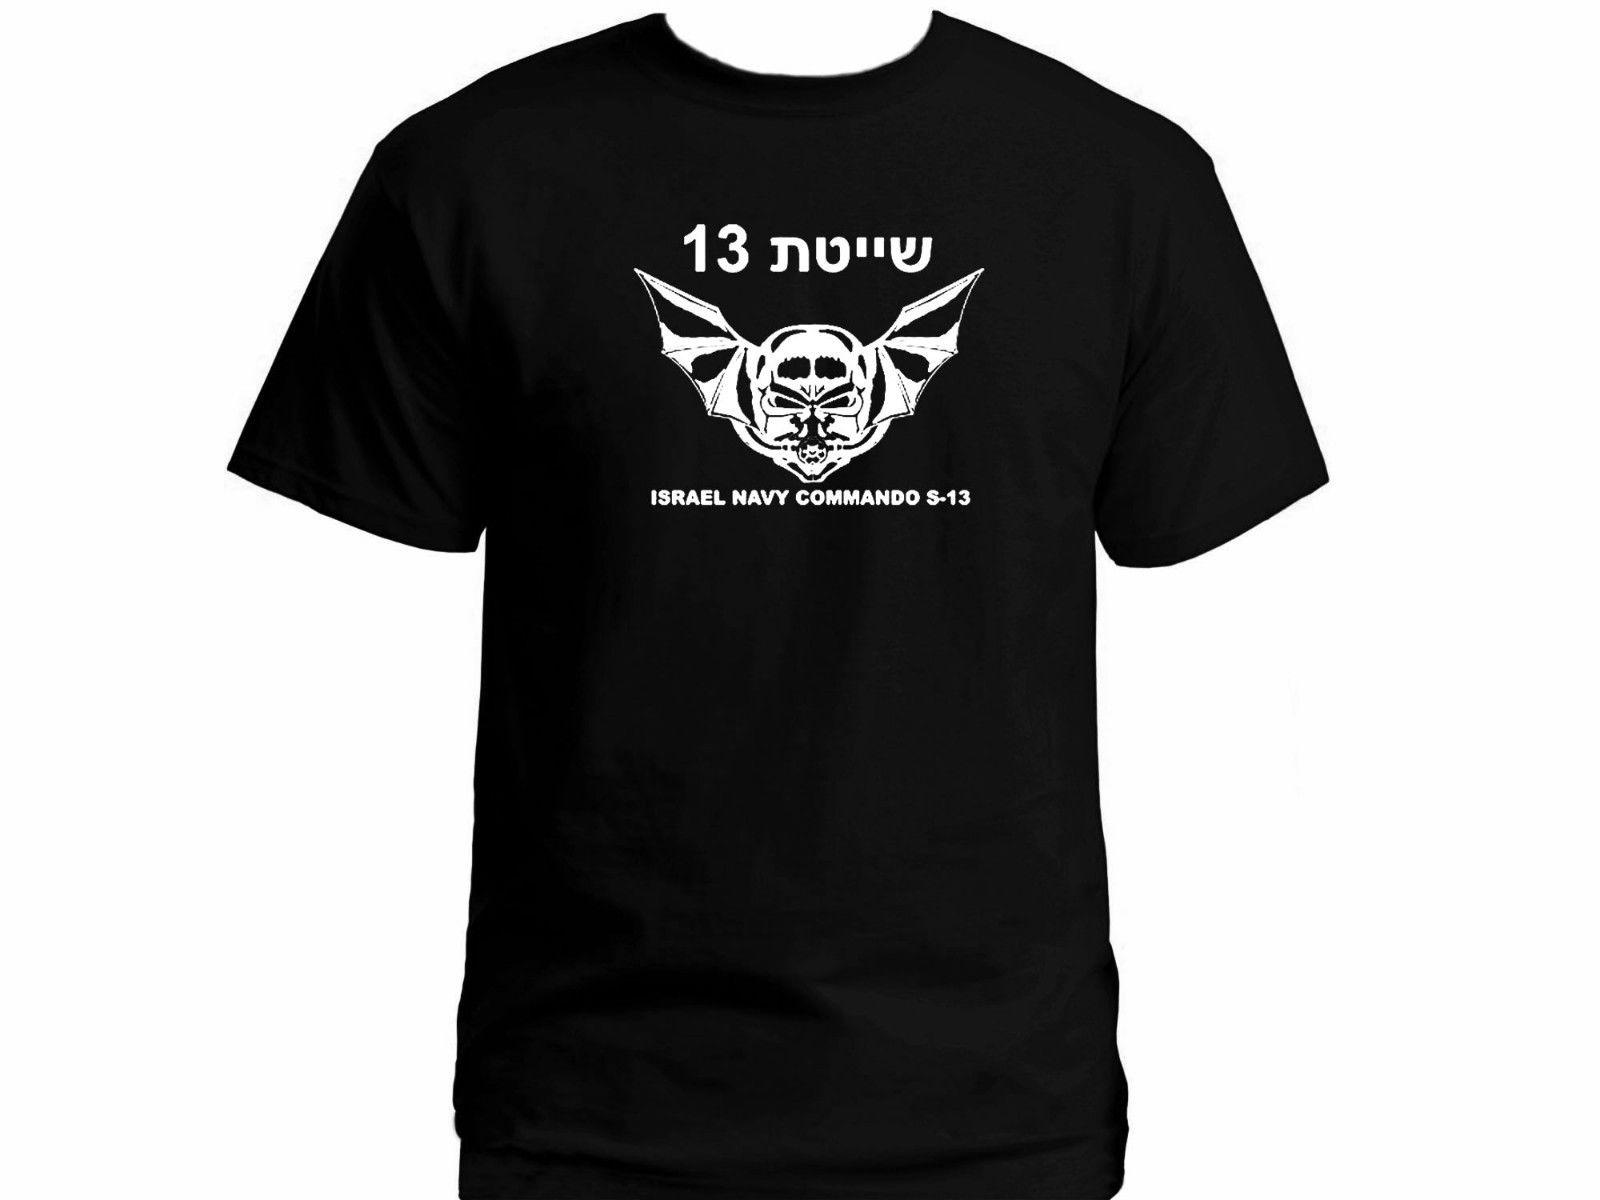 2019 del ejército israelí operaciones sayeret las FDI zahal Marina Shayetet 13 s-13 negro t camisa